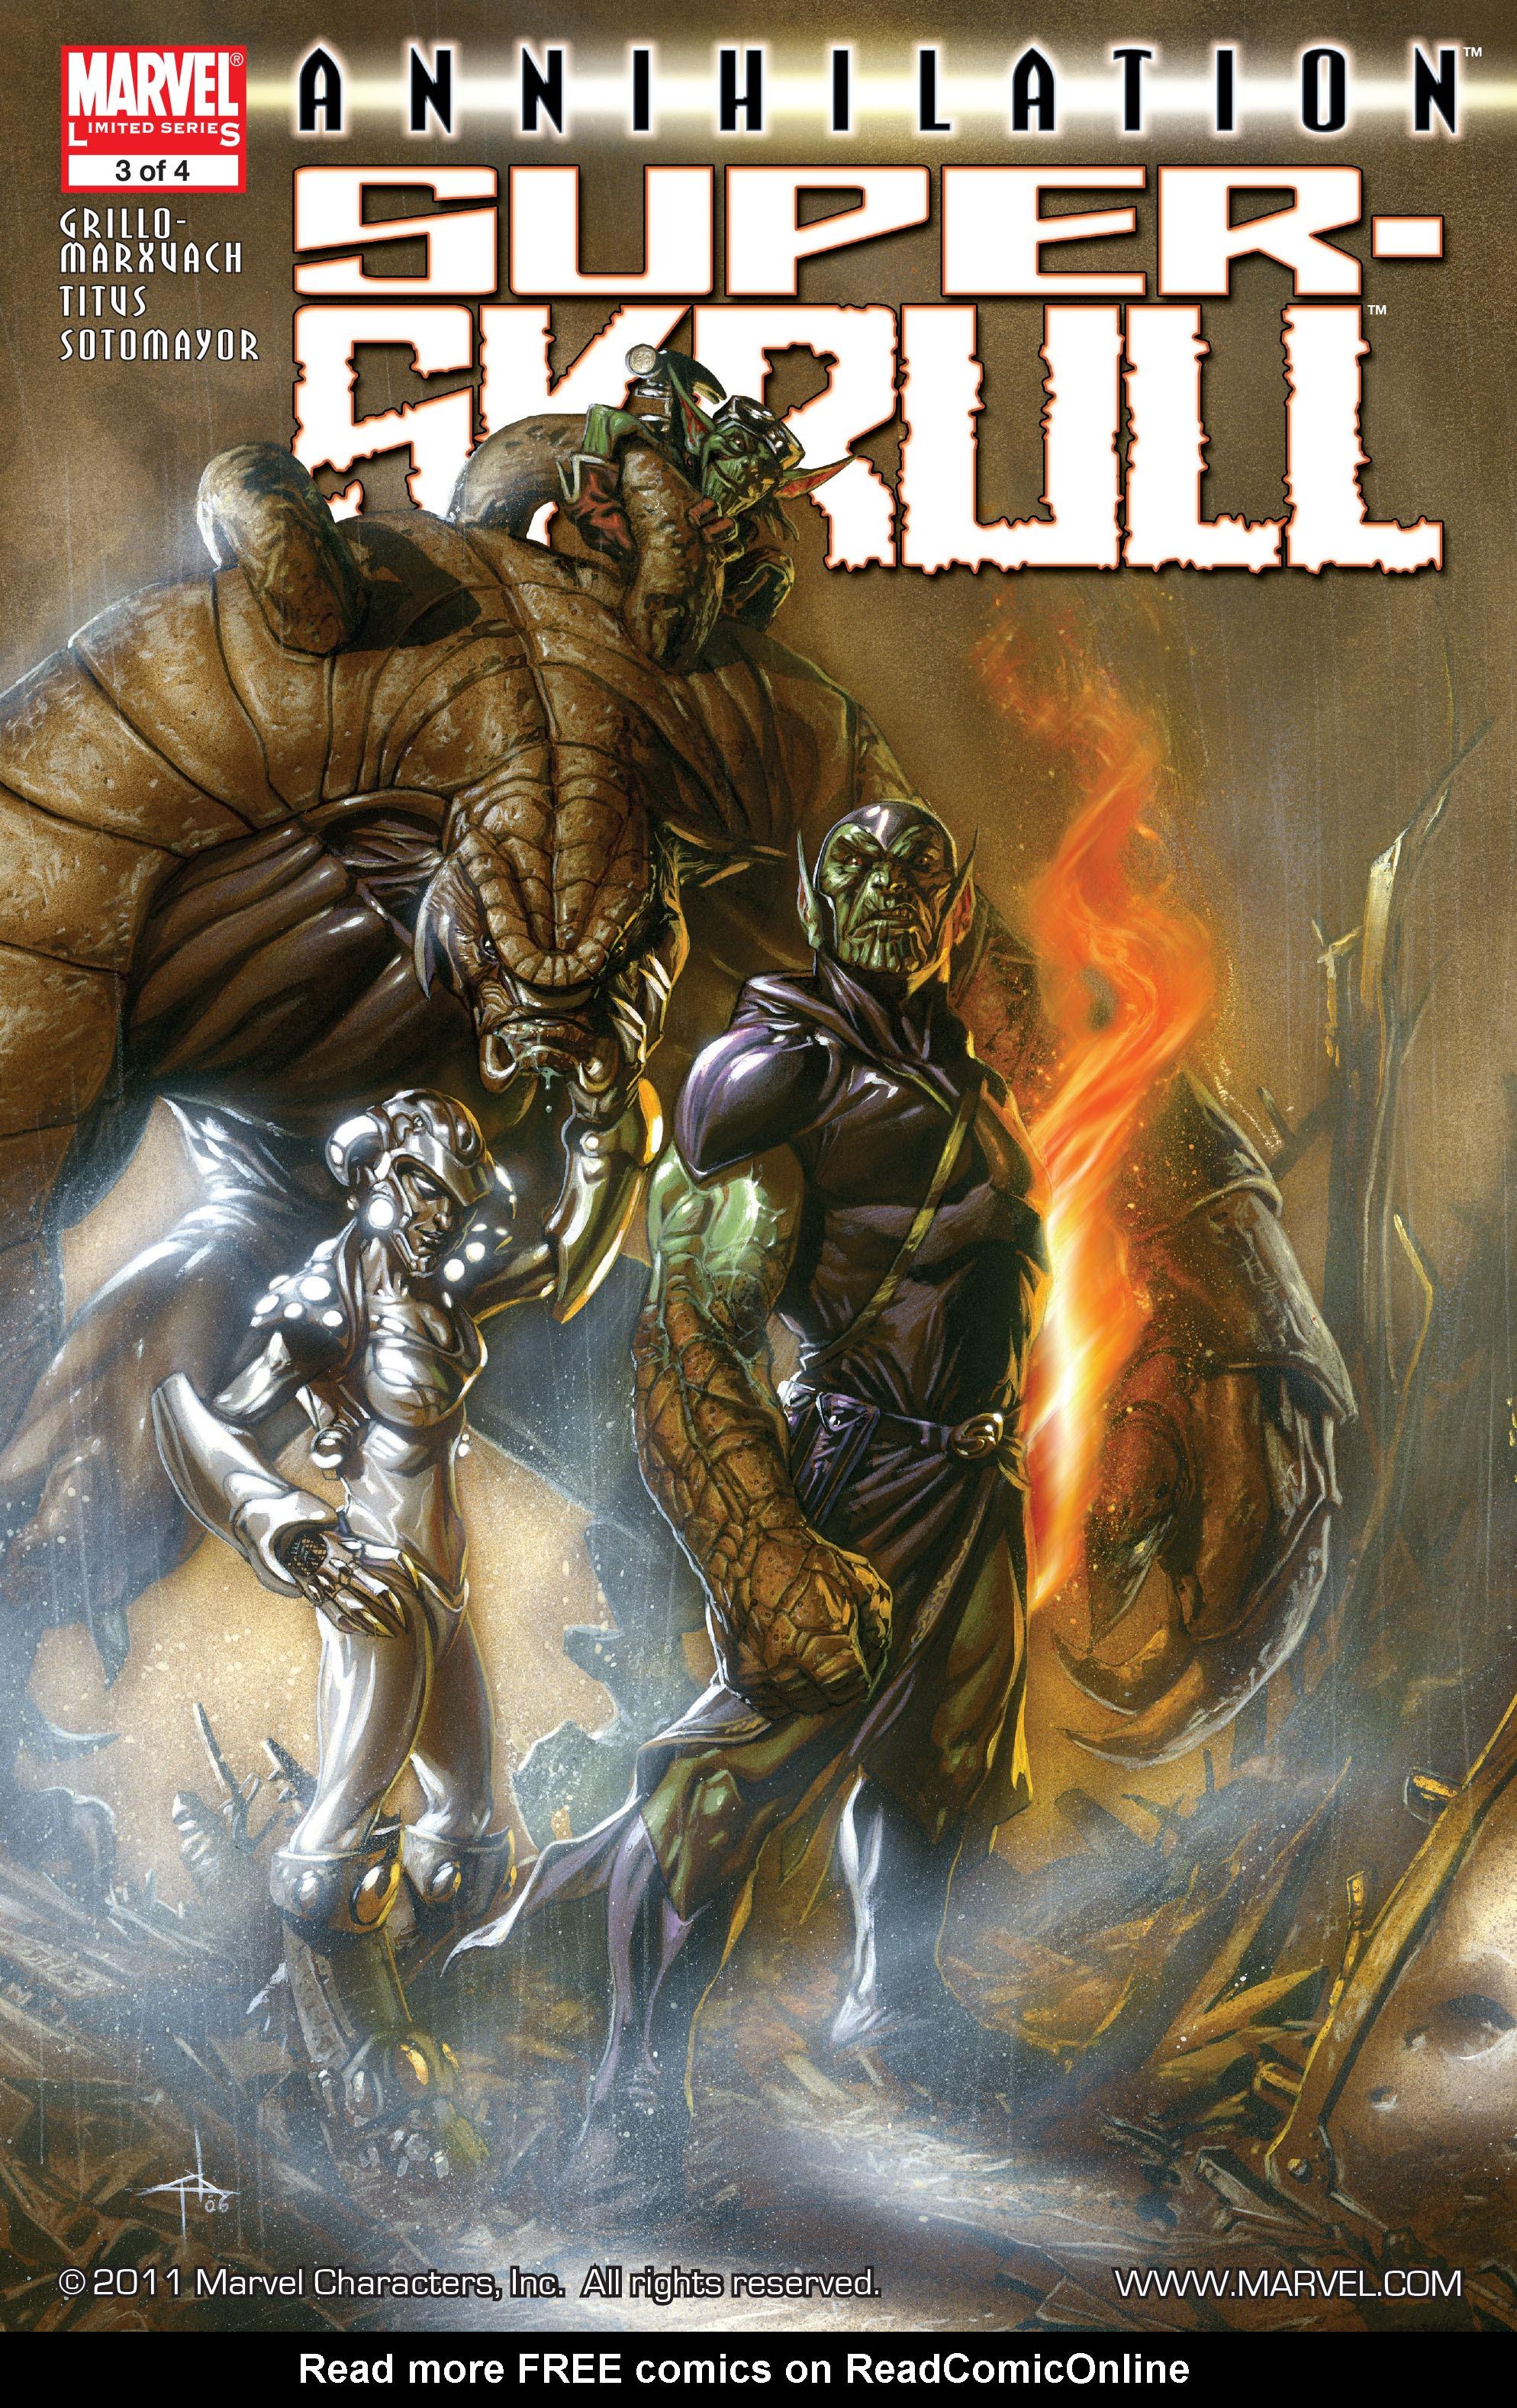 Read online Annihilation: Super-Skrull comic -  Issue #3 - 1